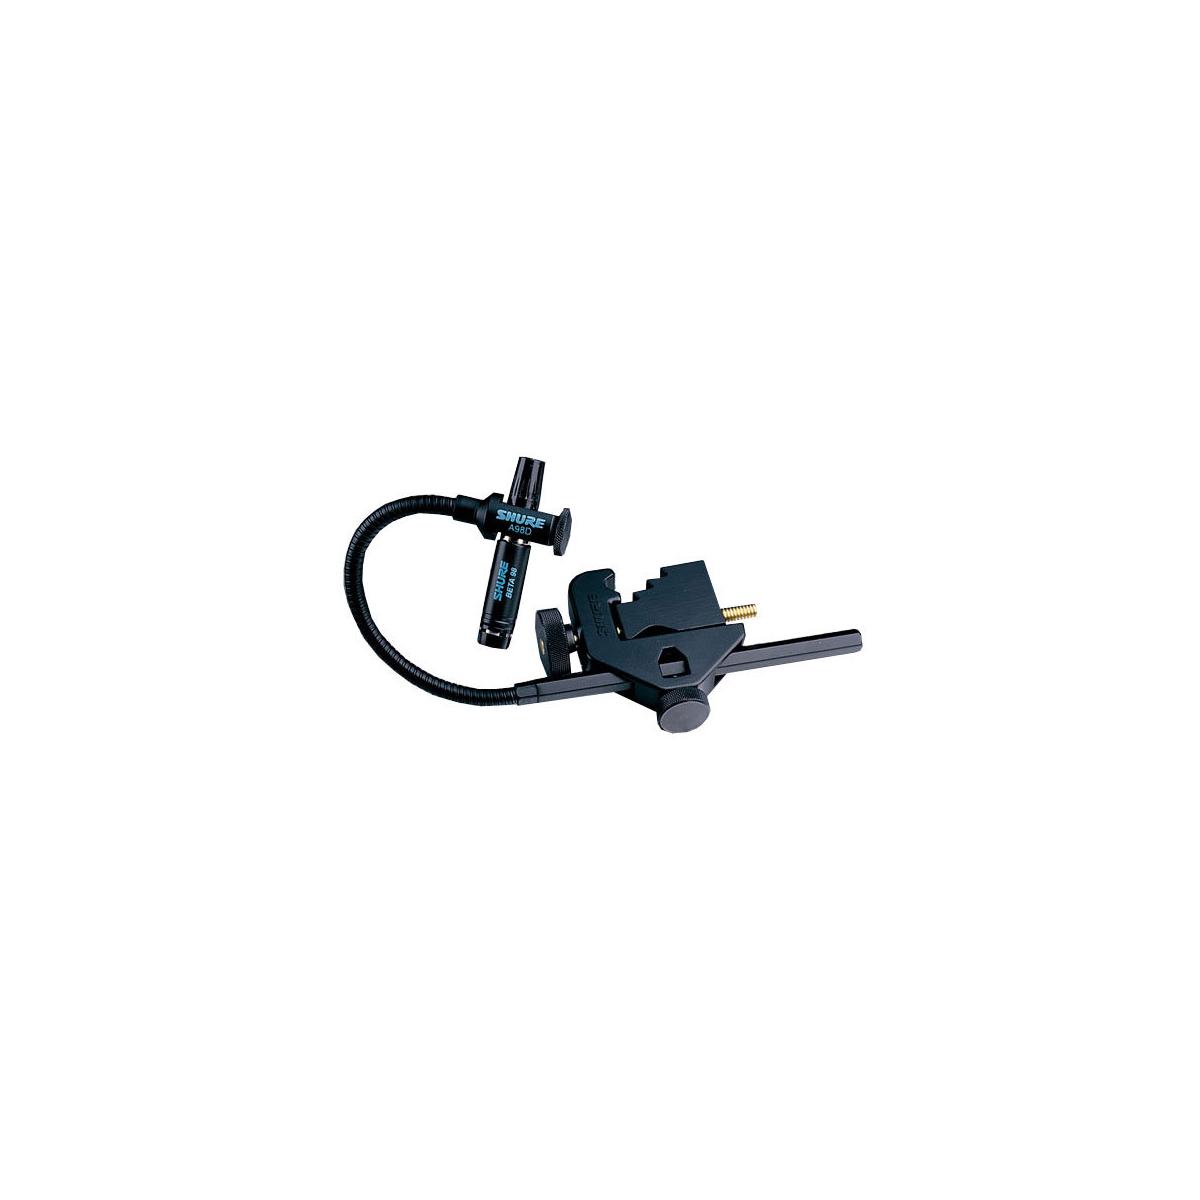 Micros instruments - Shure - Beta98 D/S